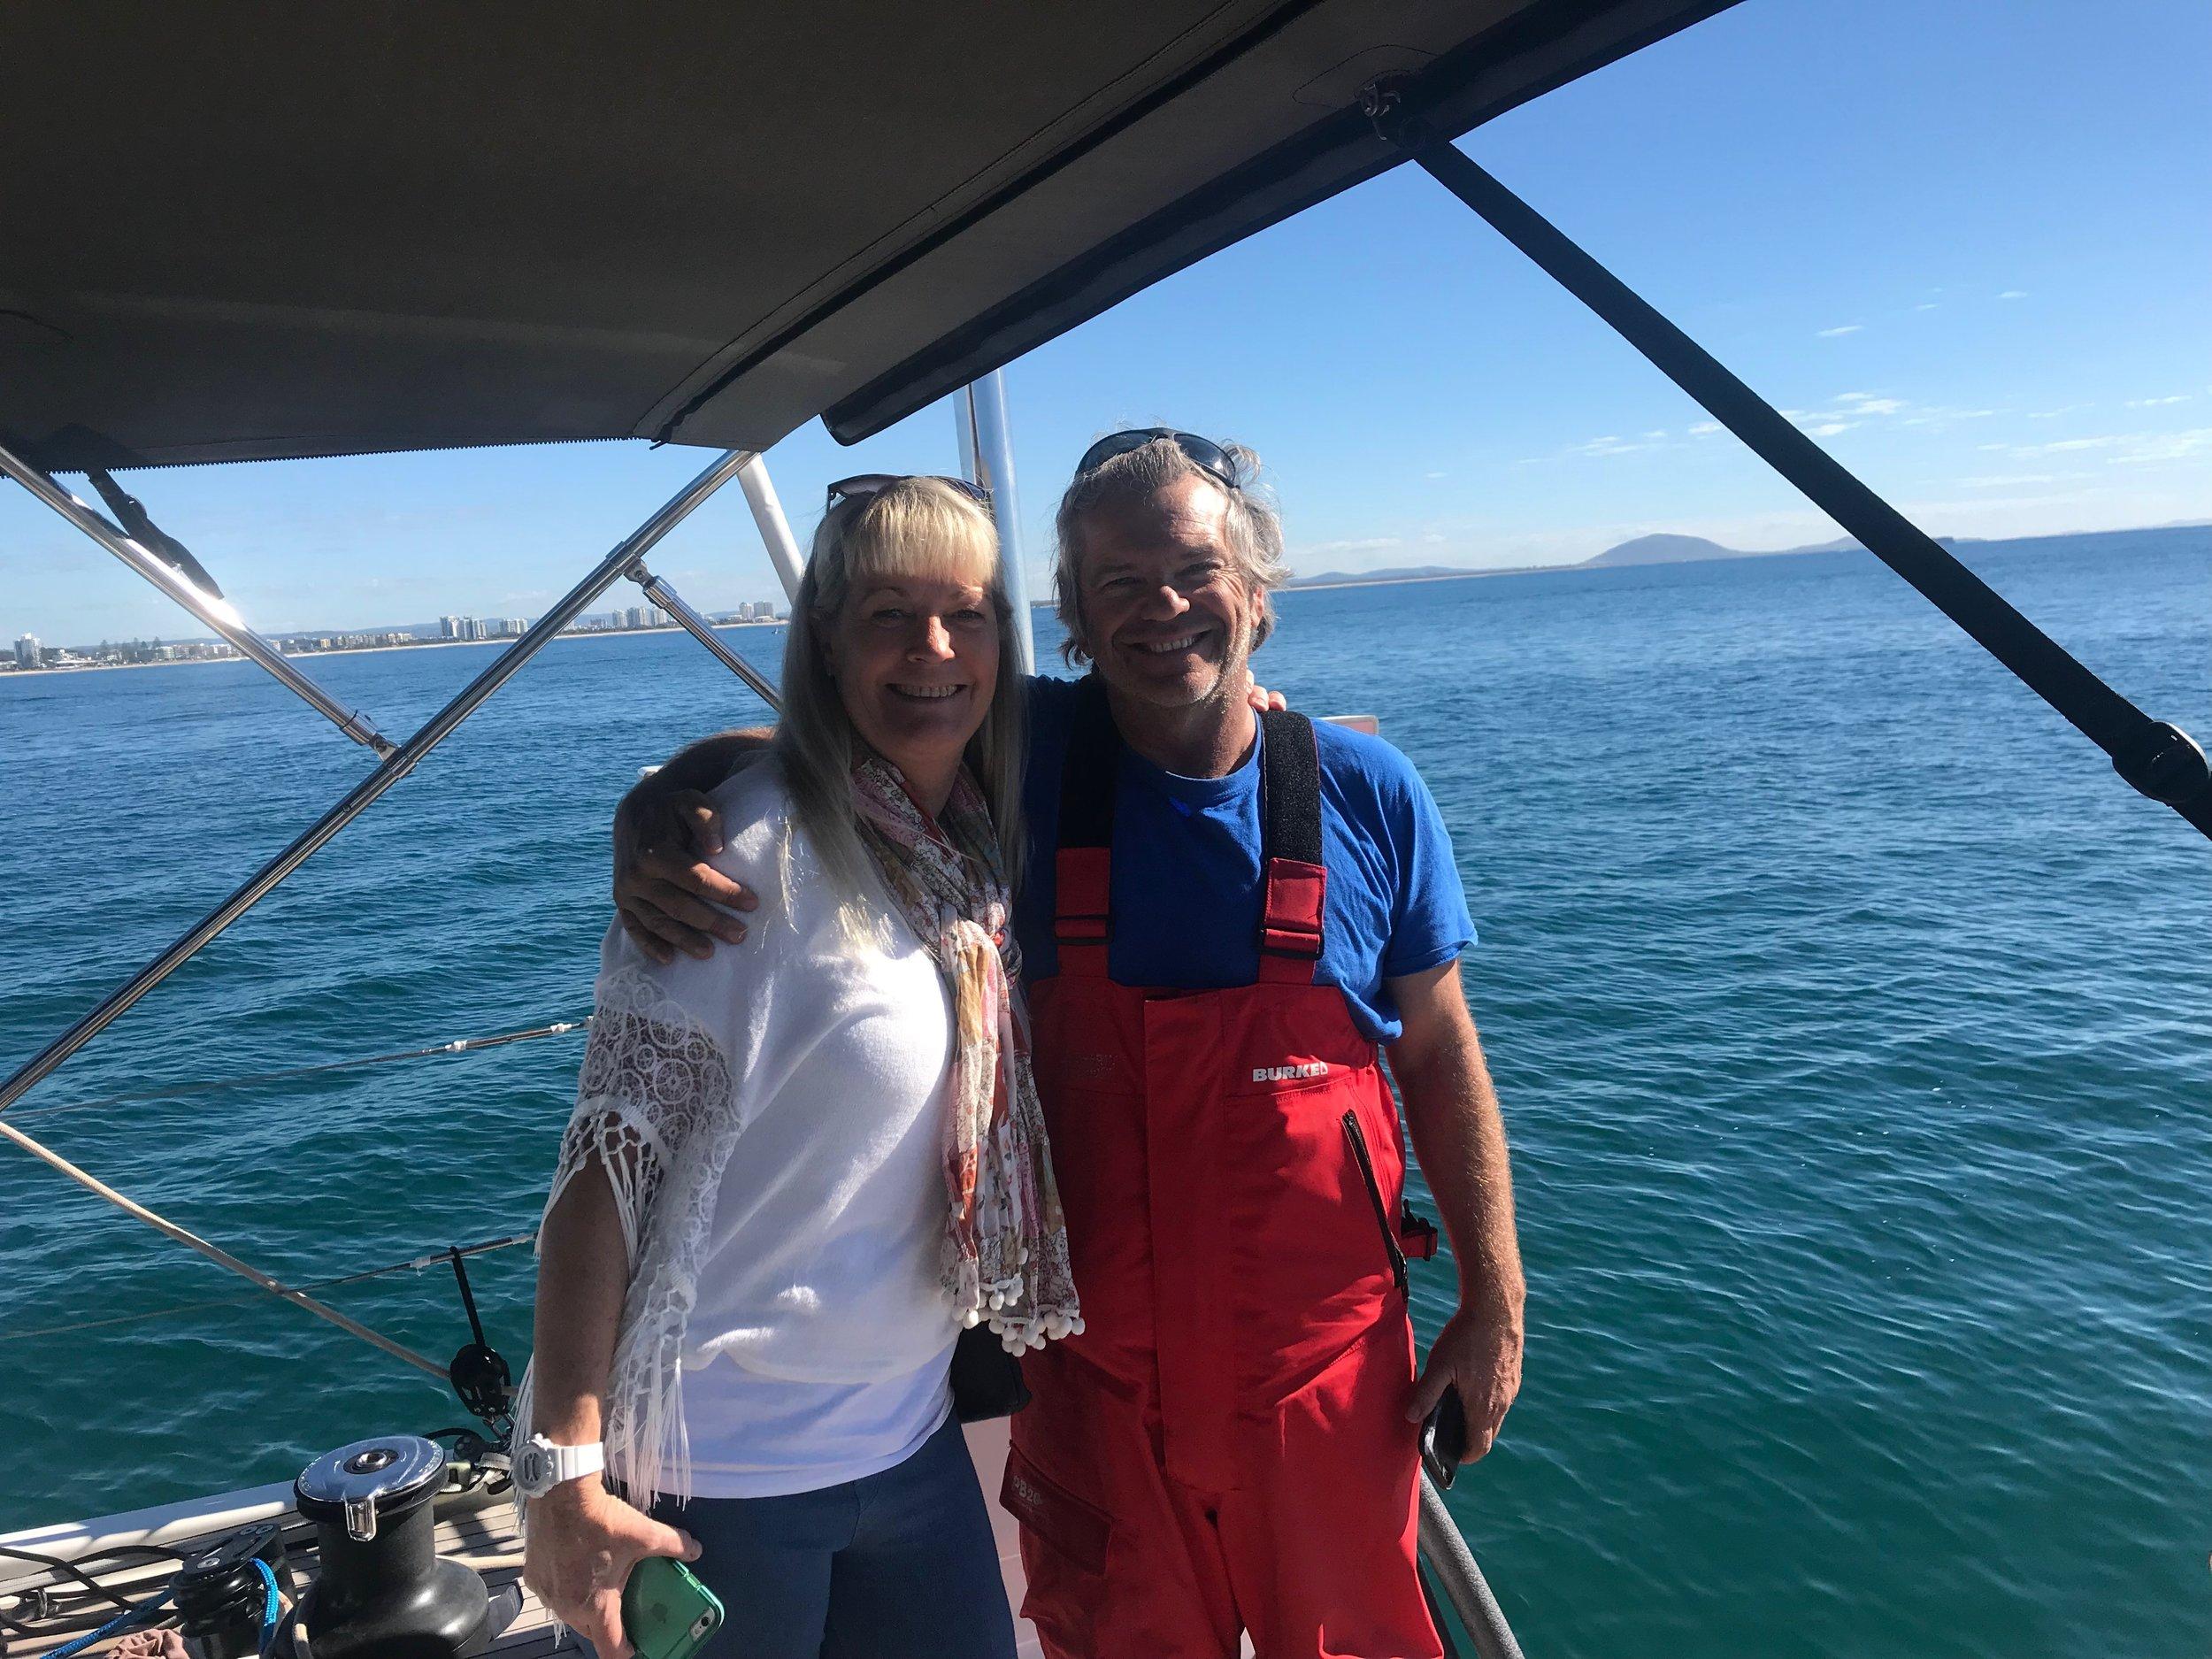 MAtt and cassie - our saviour in mooloolaba